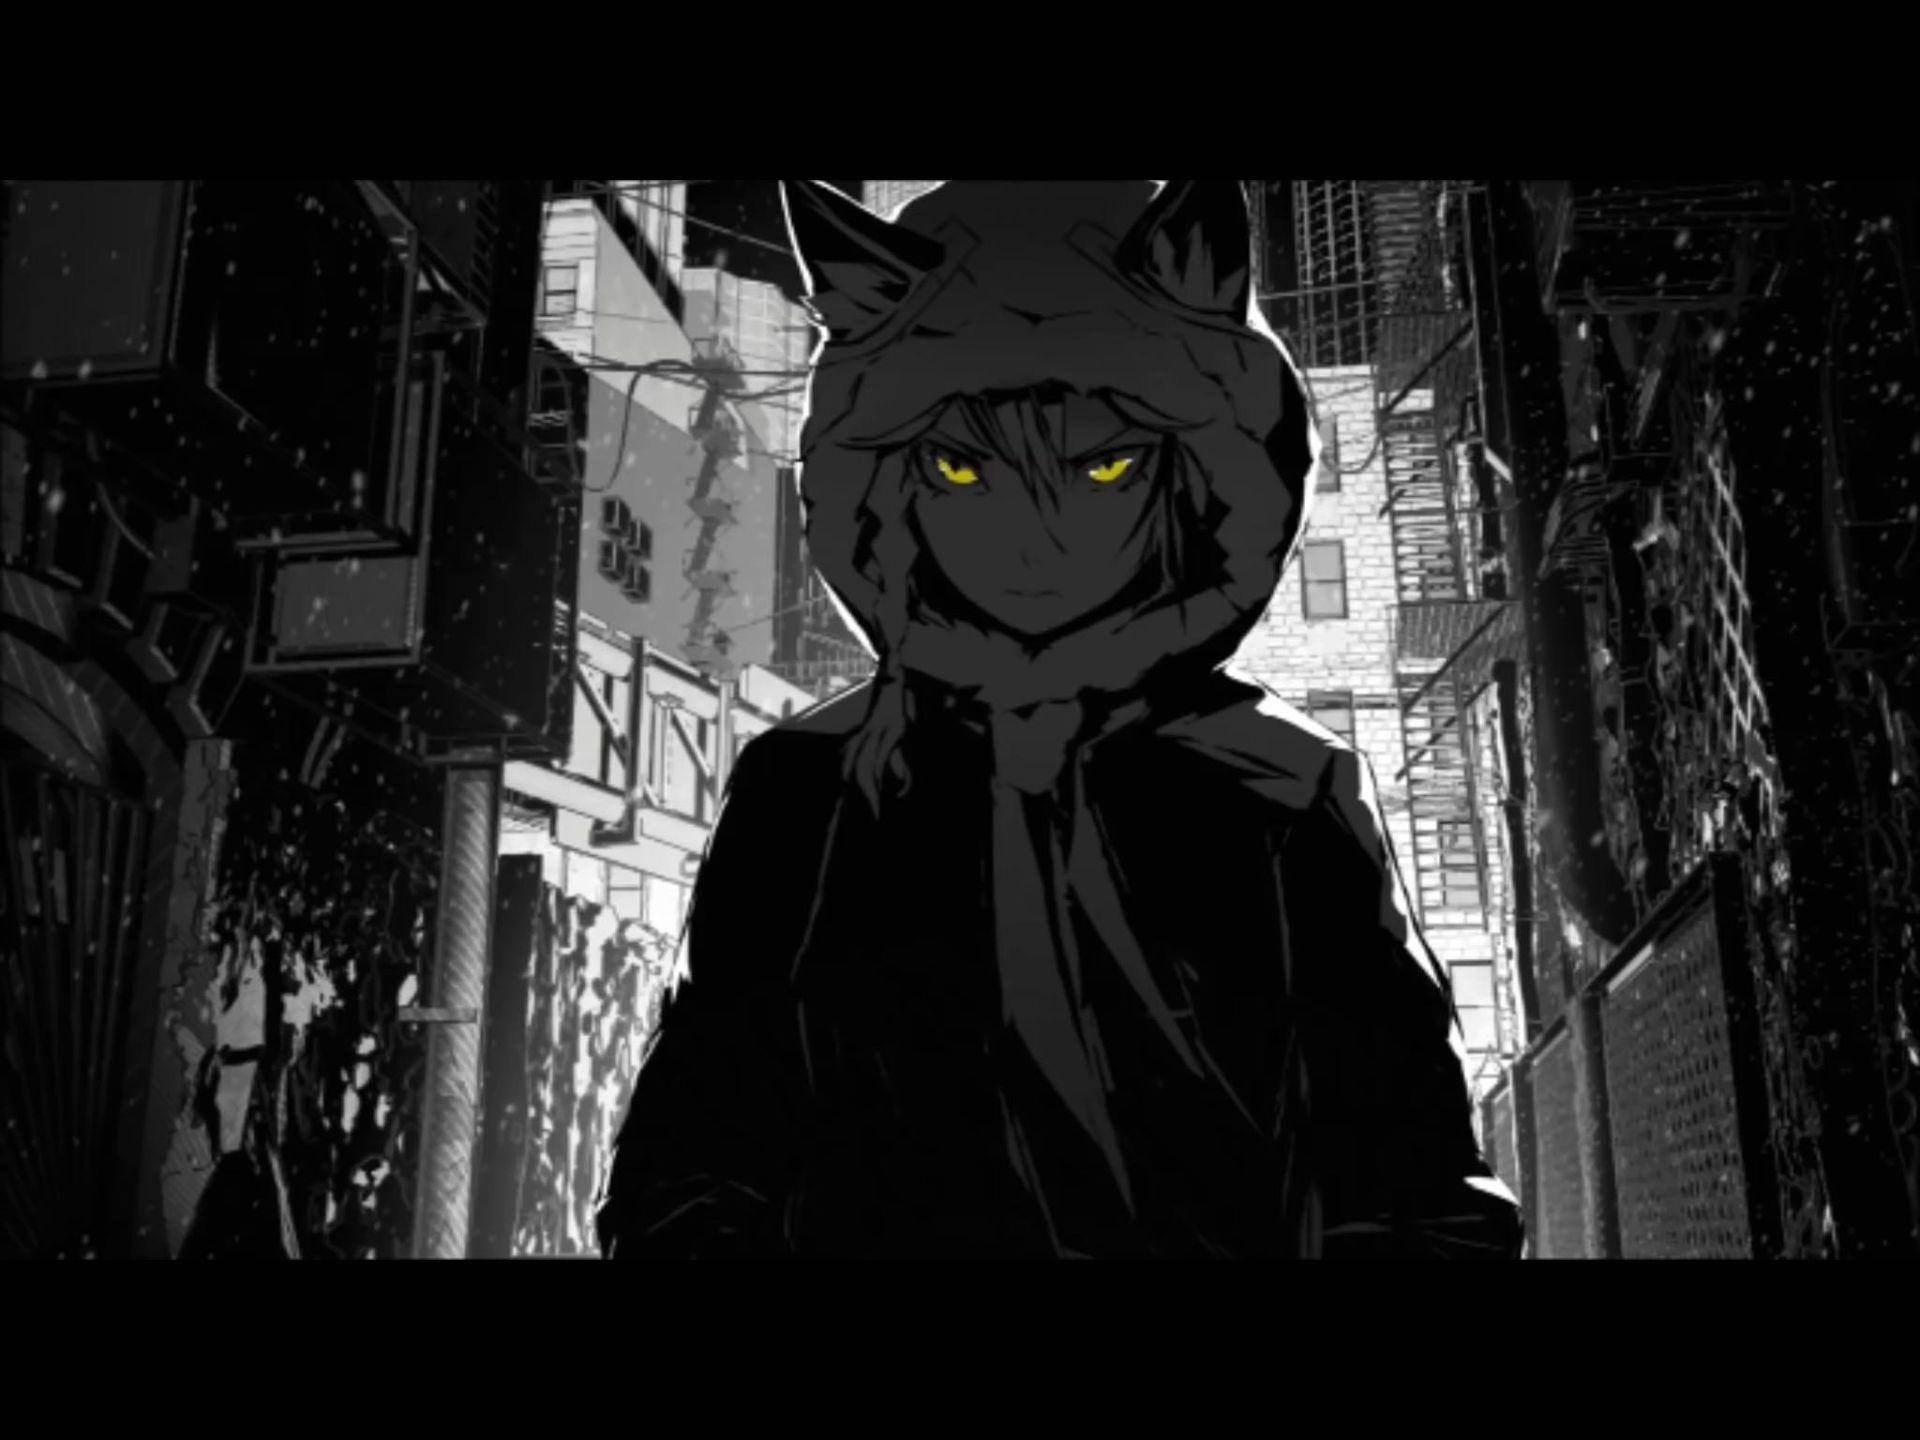 Animated Lonely Boy Wallpapers Lyrics To Songs The Wolf Phildel Nightcore Wattpad